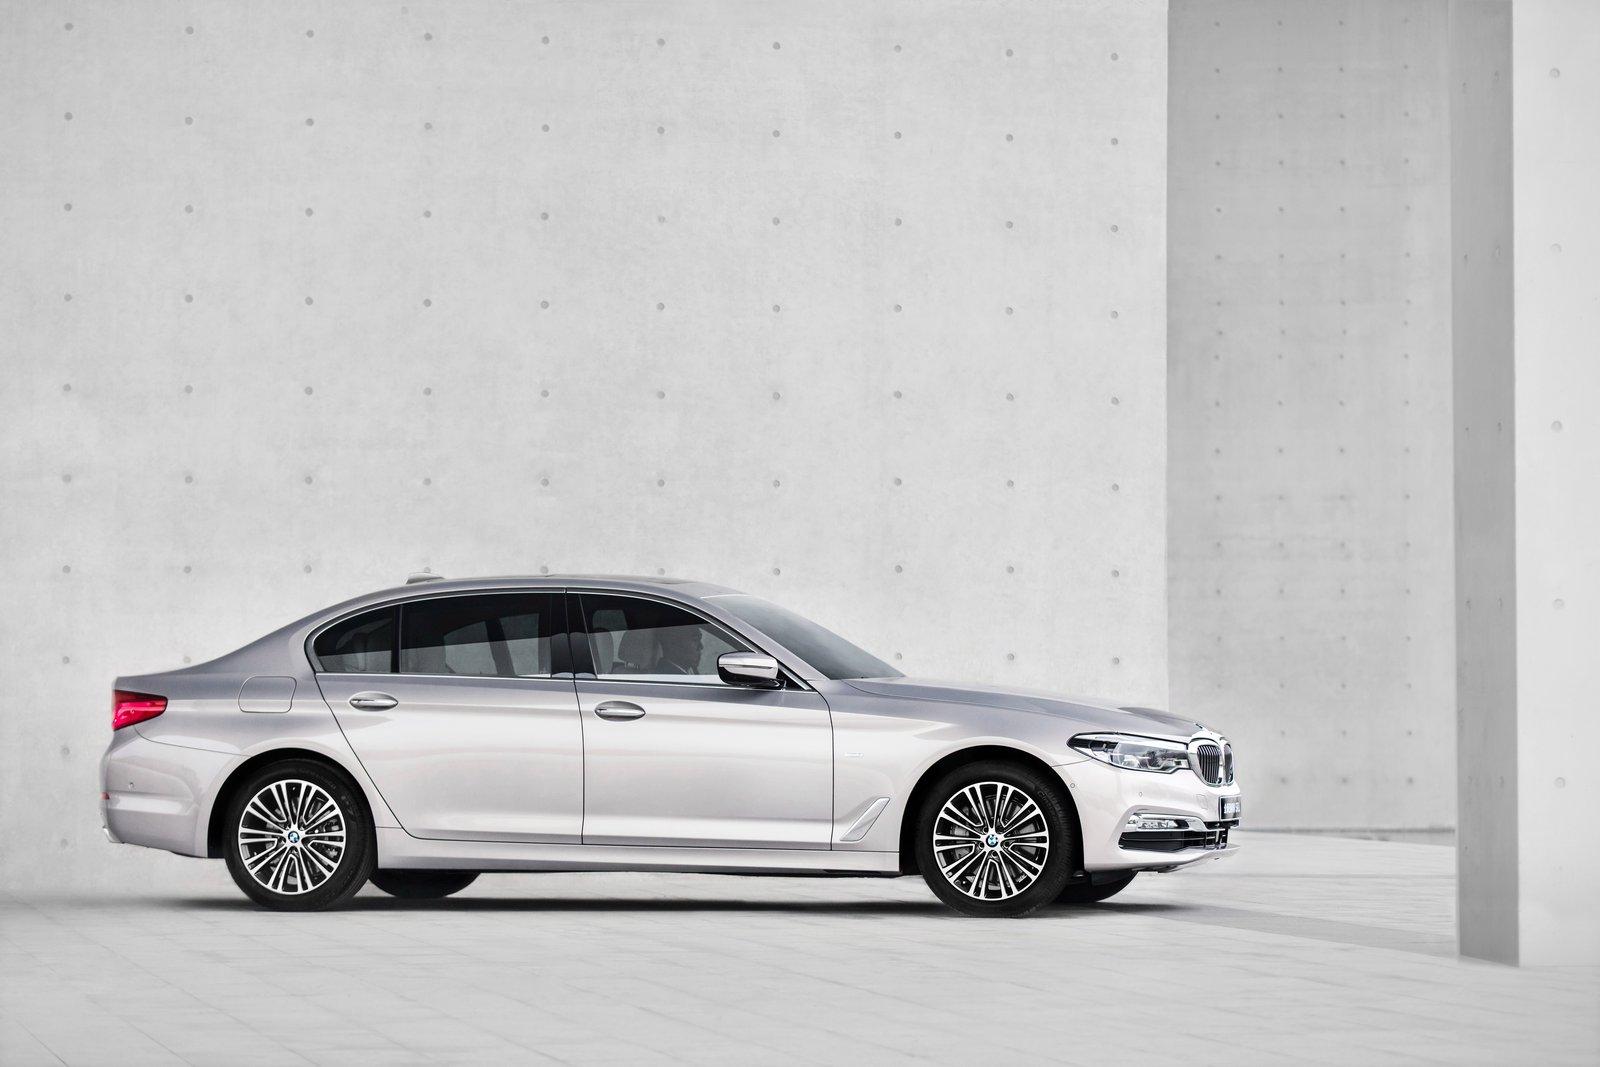 BMW-5-Series-LWB-9.jpg